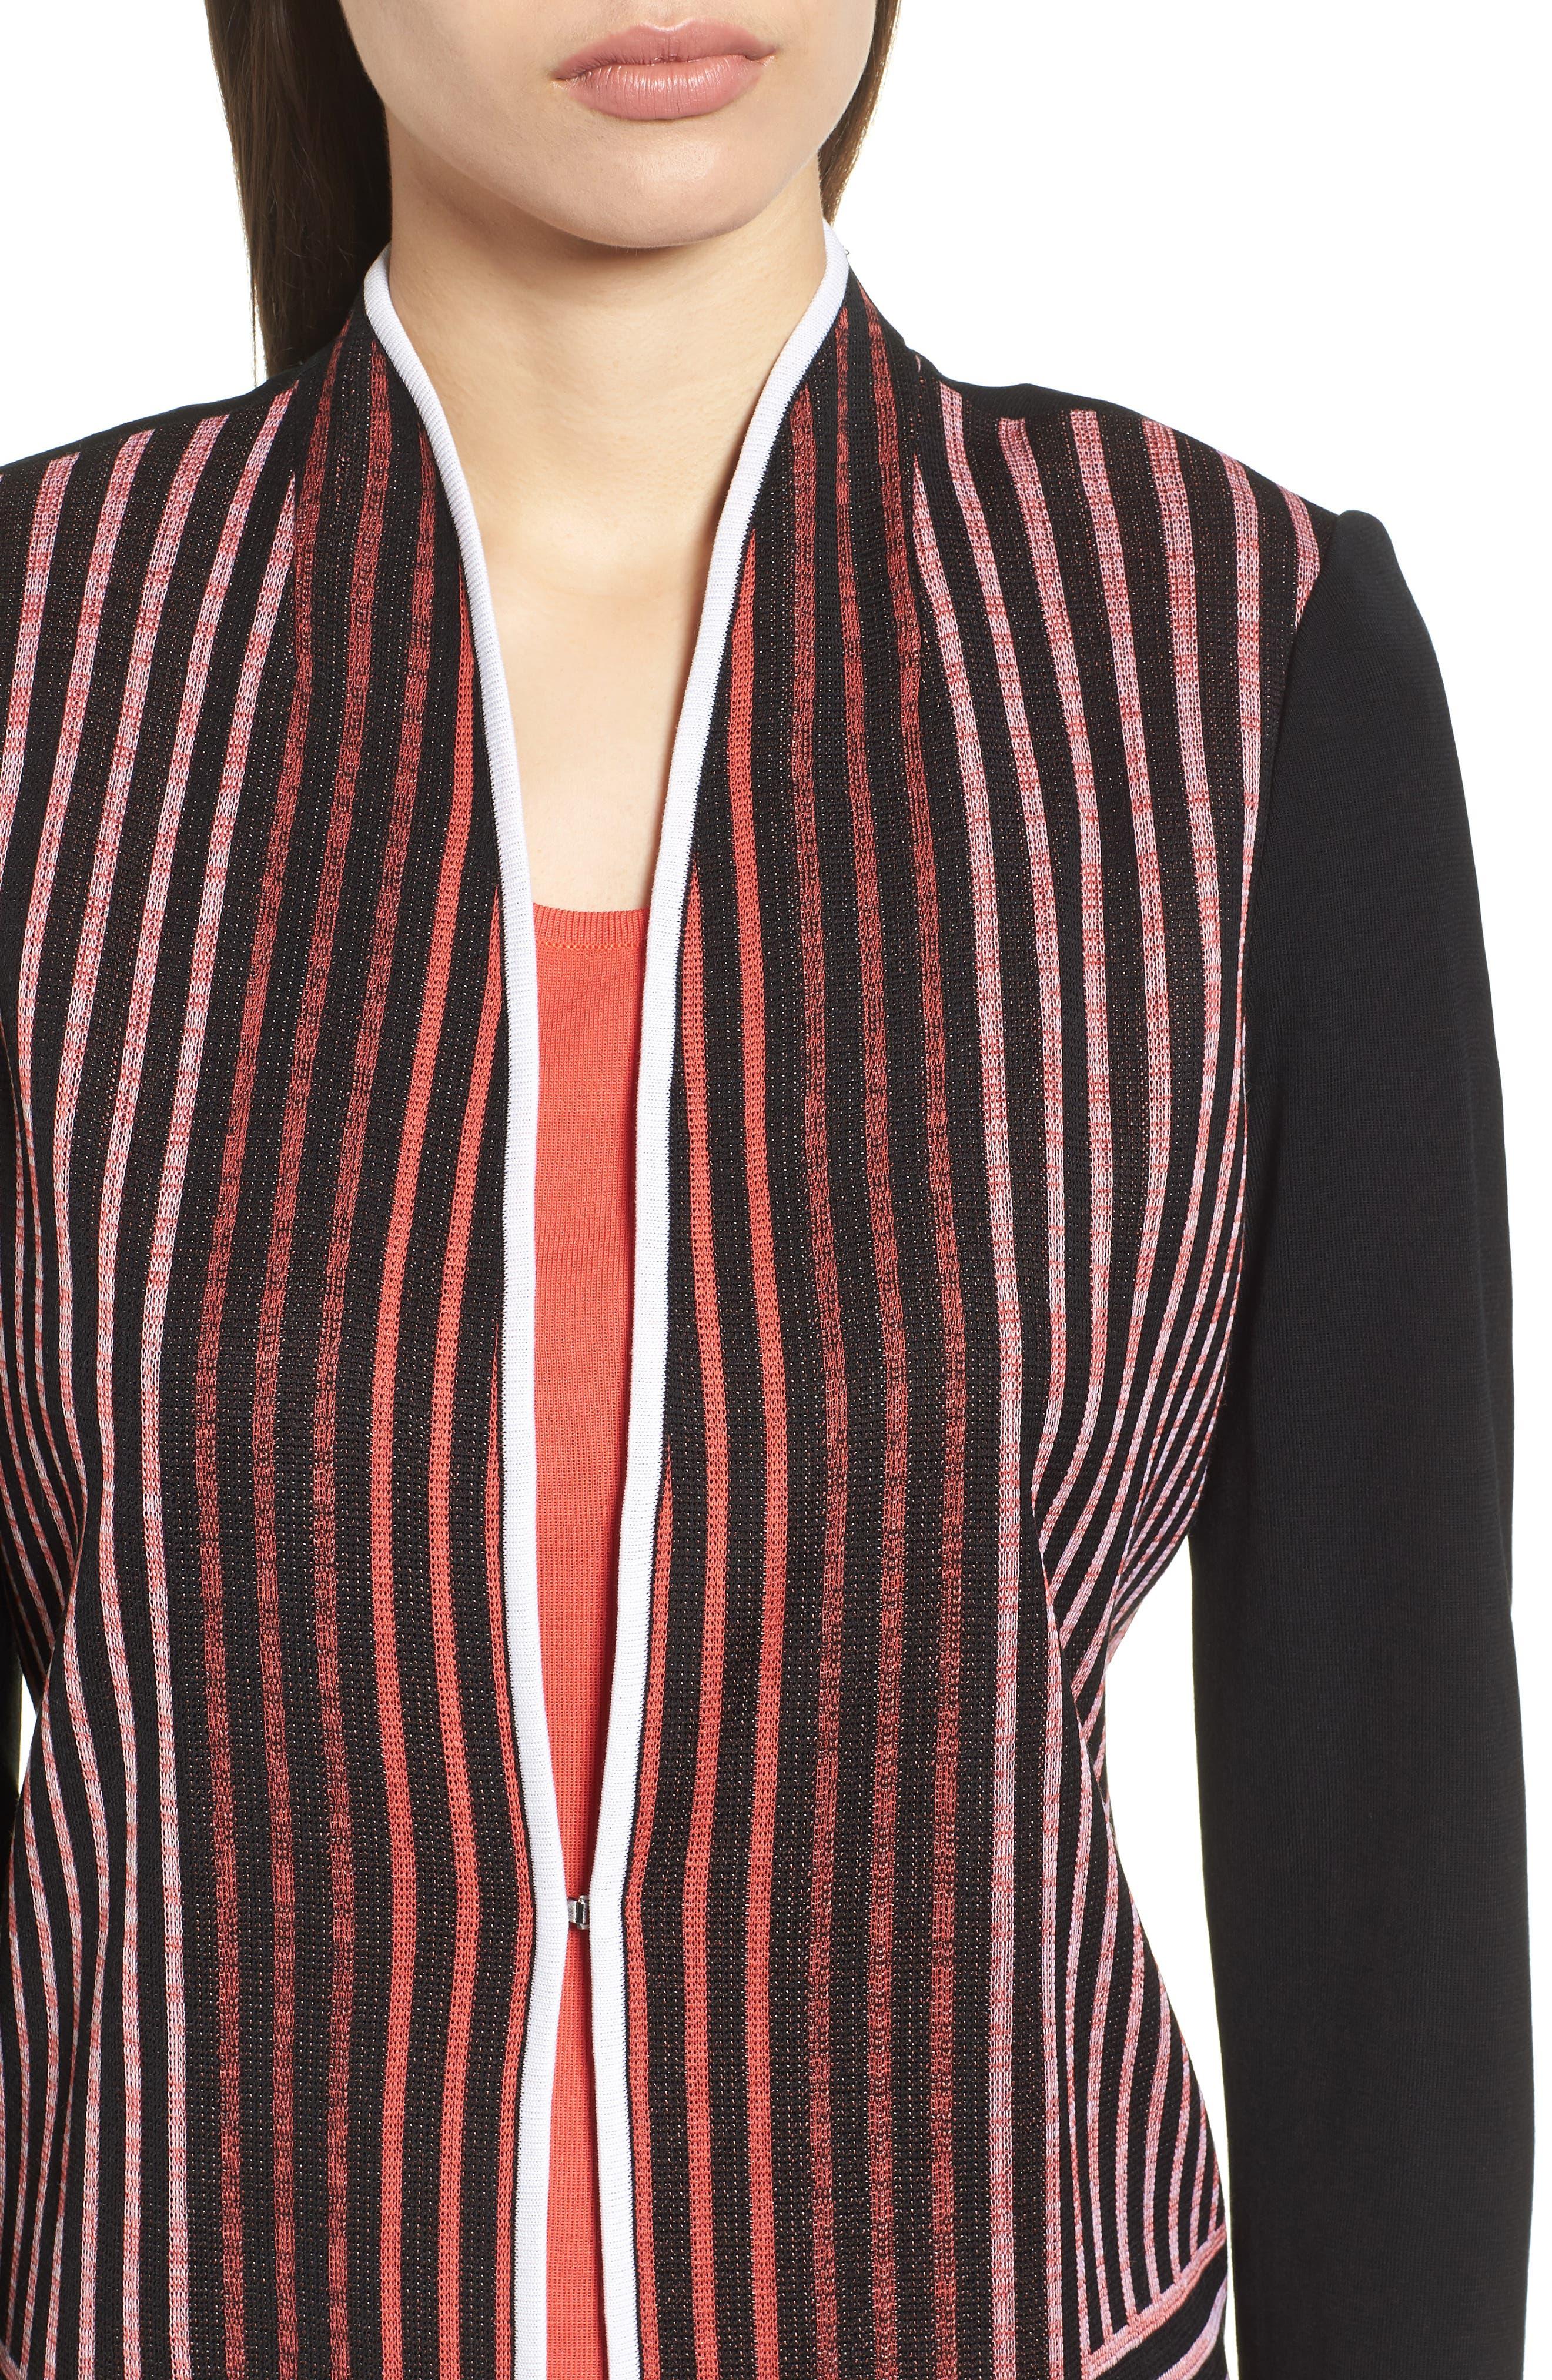 MING WANG,                             Stripe Knit Jacket,                             Alternate thumbnail 4, color,                             019